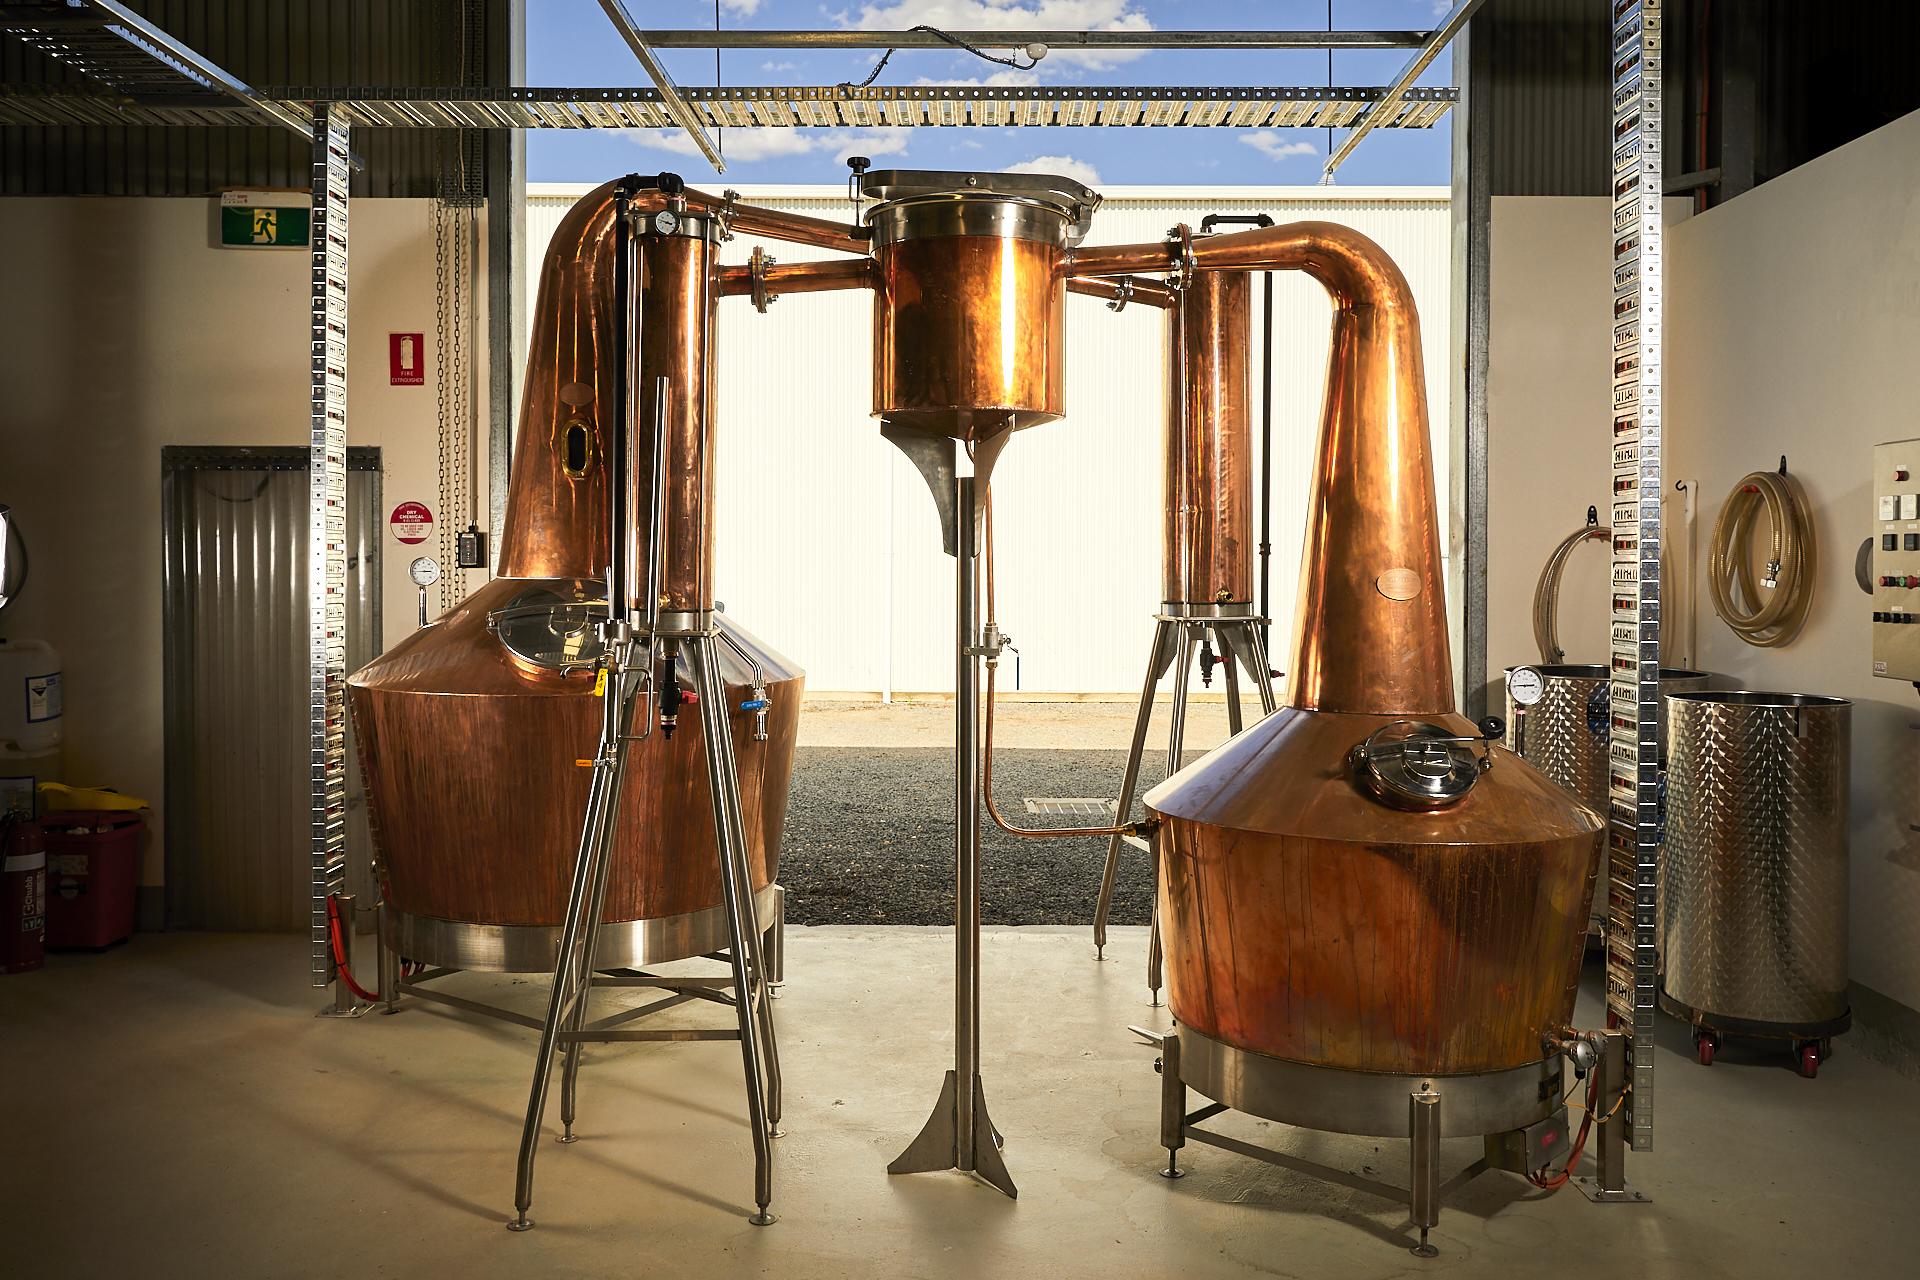 Distillery therme косметика купить